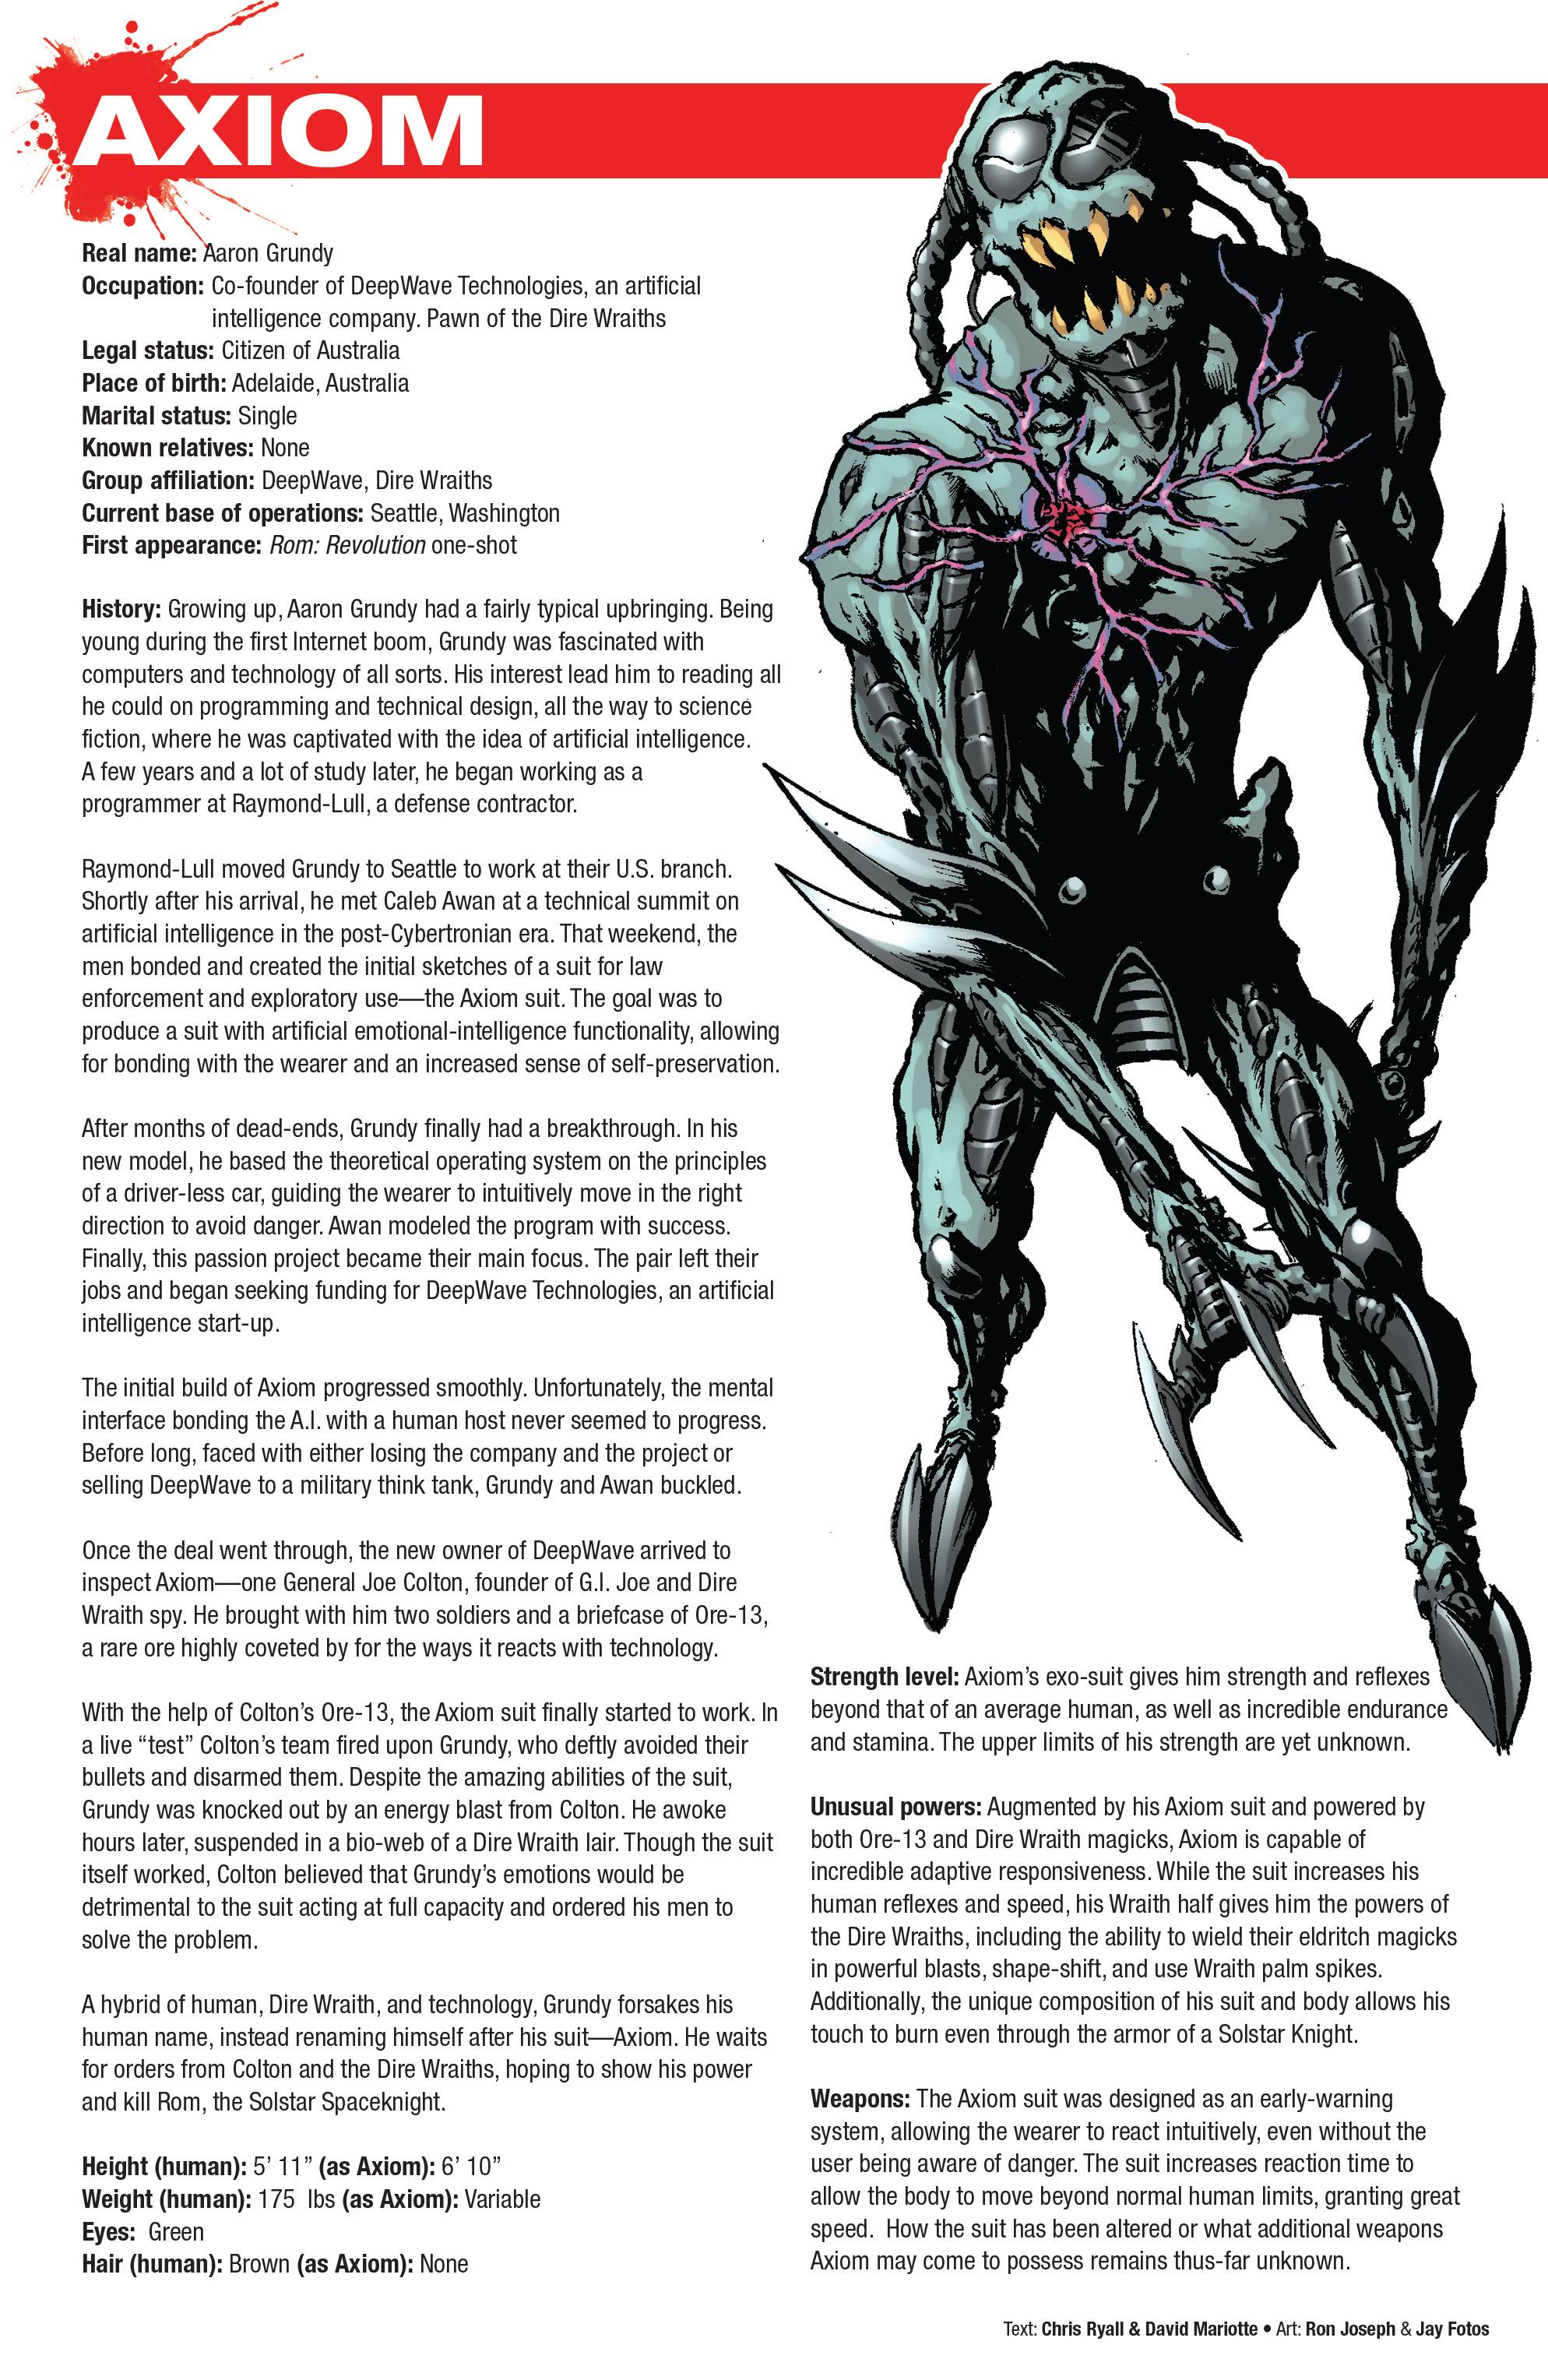 Read online Hasbro Heroes Sourcebook comic -  Issue #1 - 14